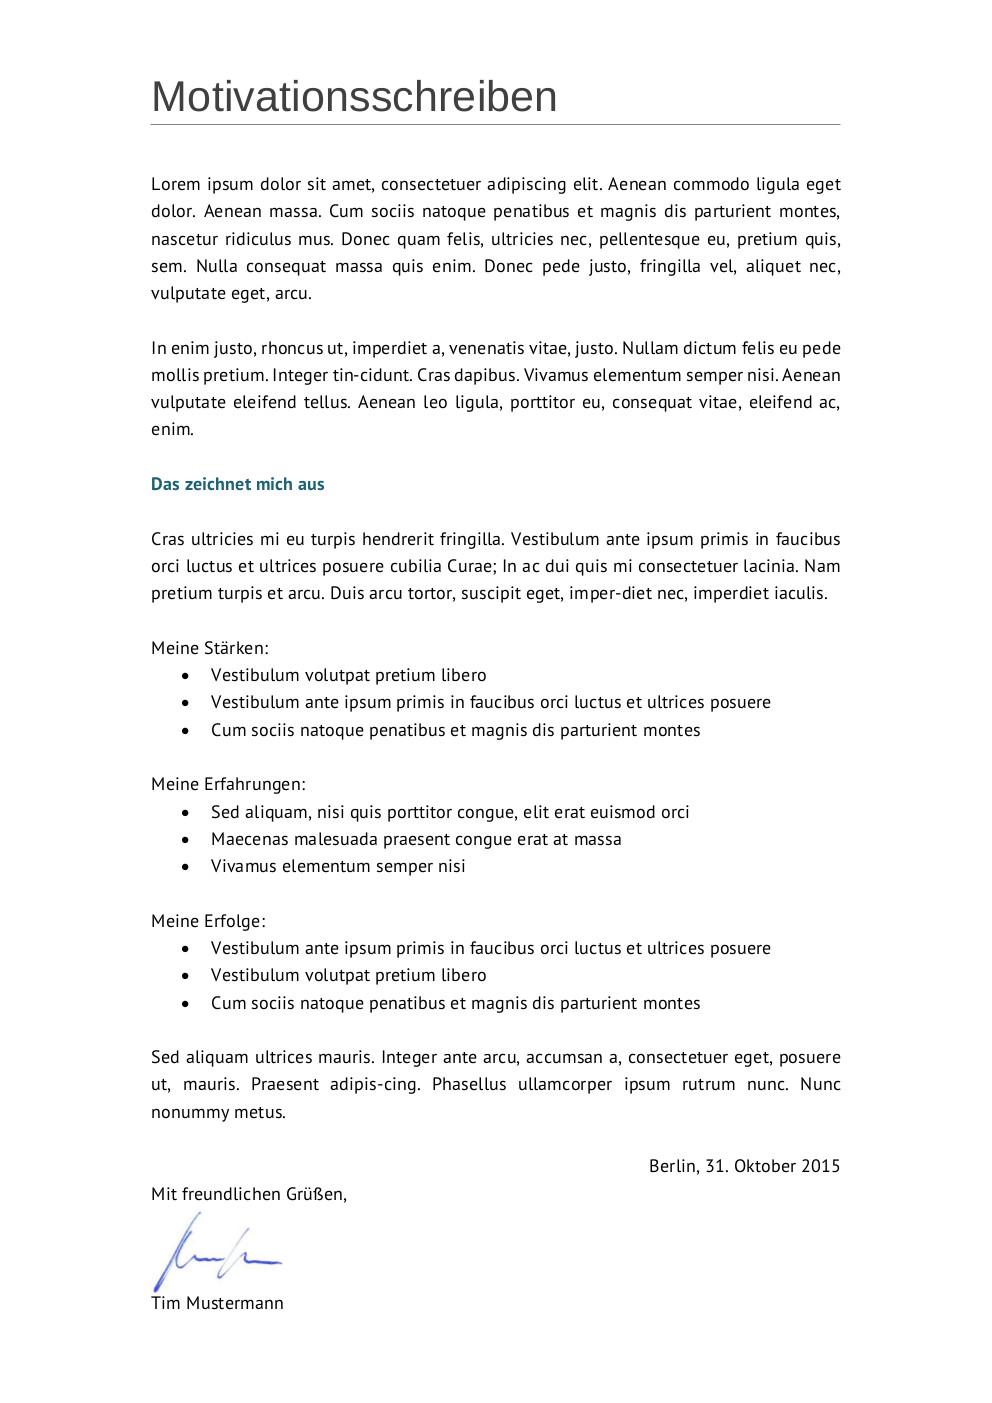 Bewerbungsmuster Techniker | Lebenslauf Designs